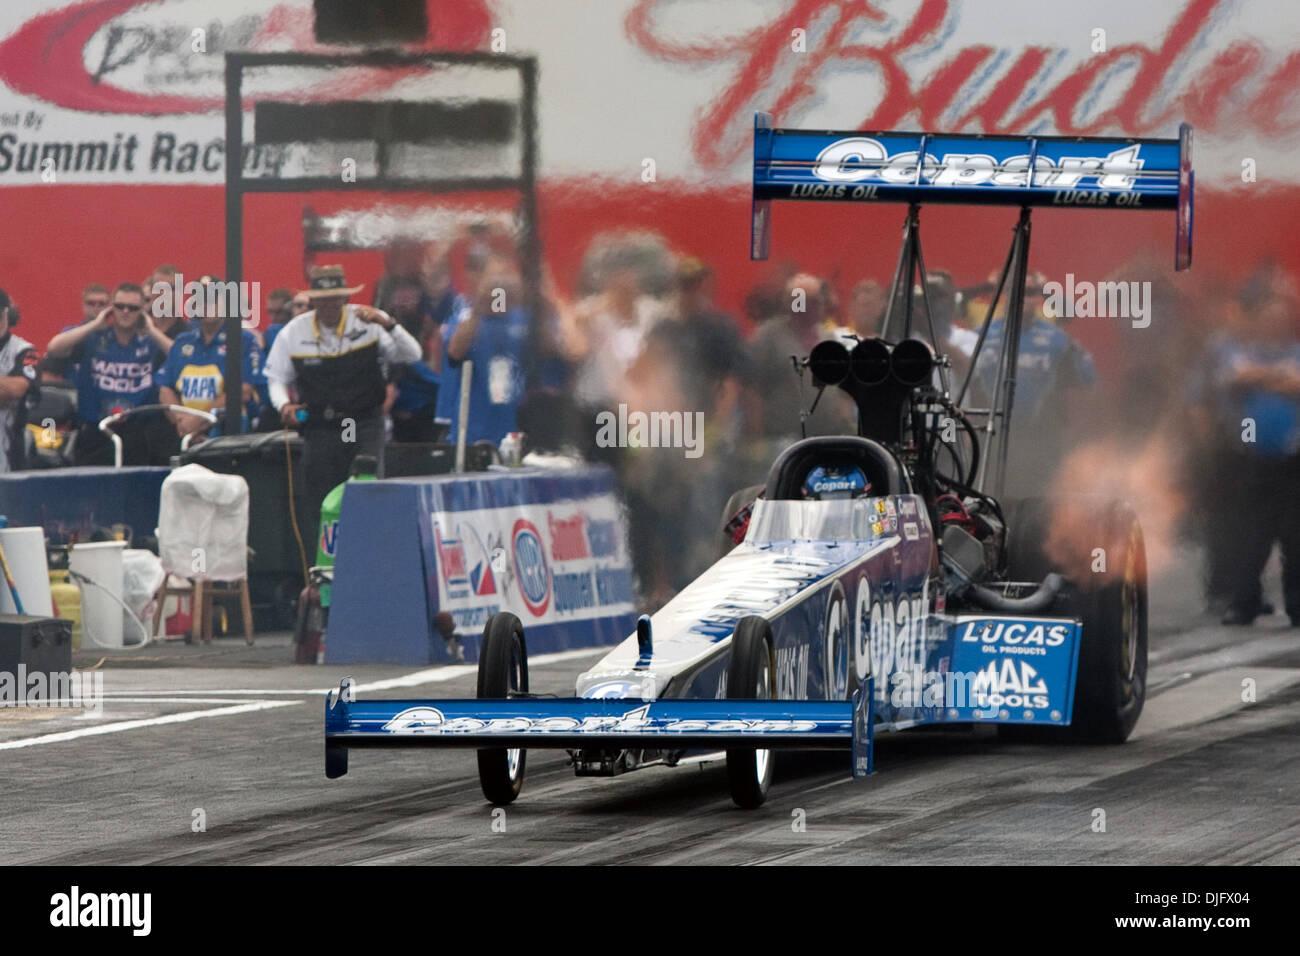 Nhra Full Throttle Drag Racing Stock Photos & Nhra Full